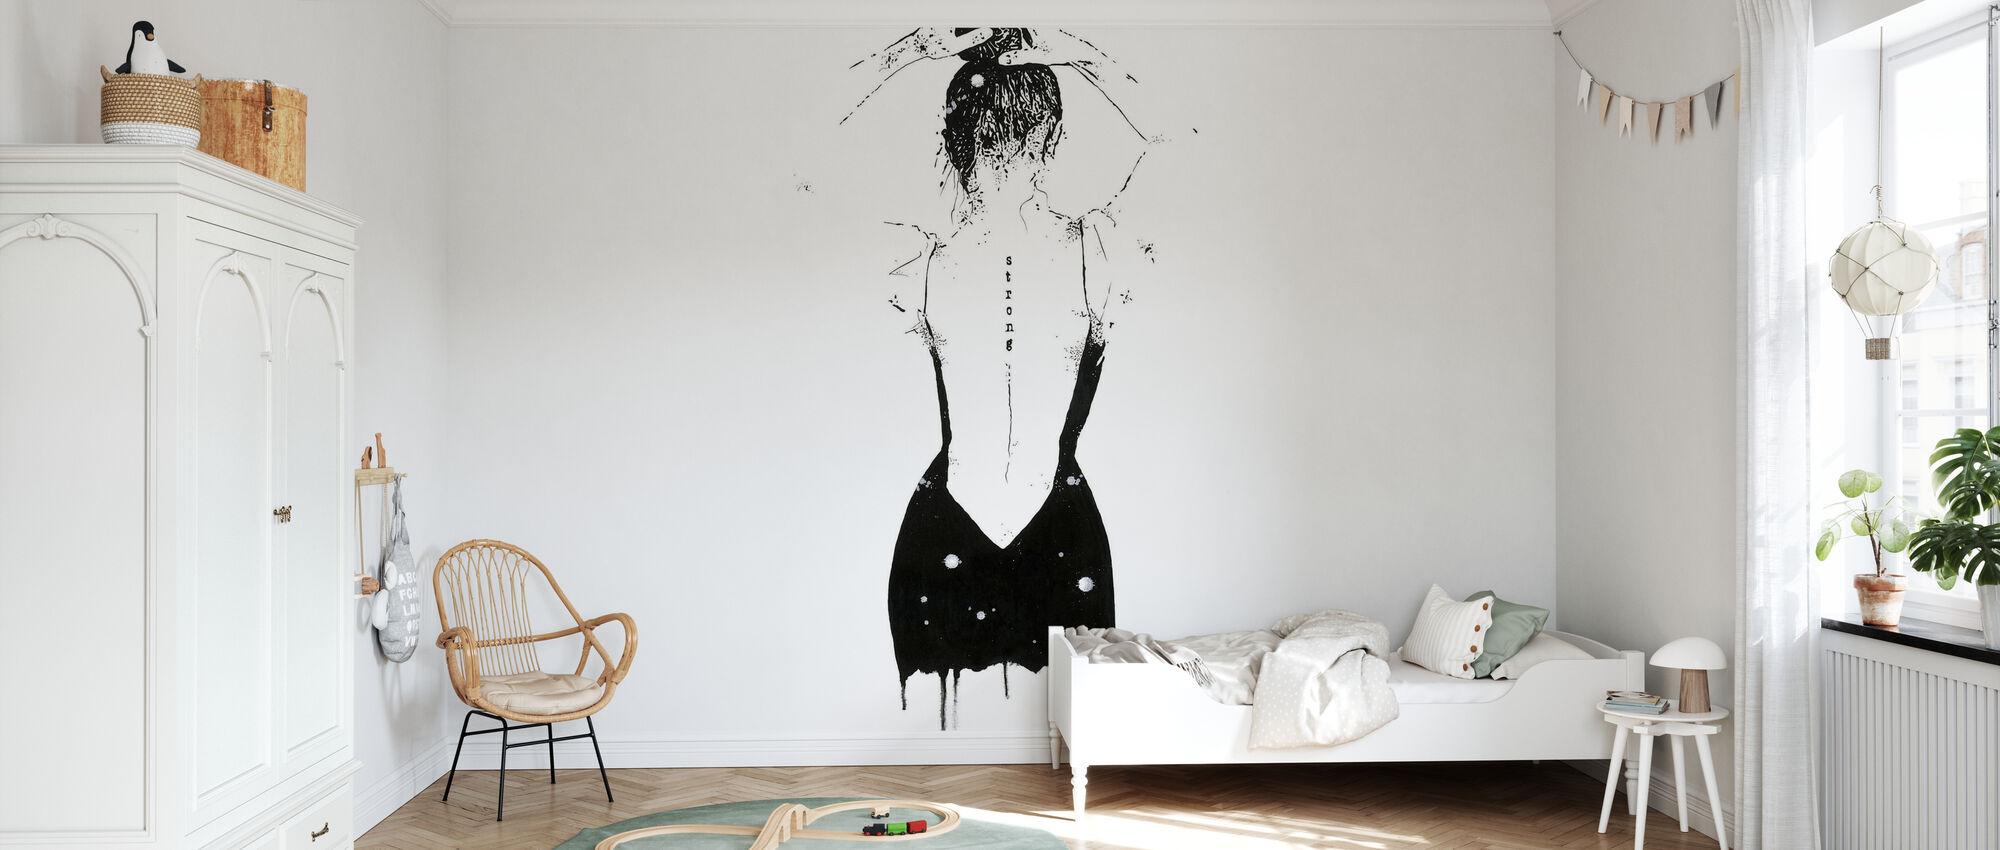 Achiever - Wallpaper - Kids Room